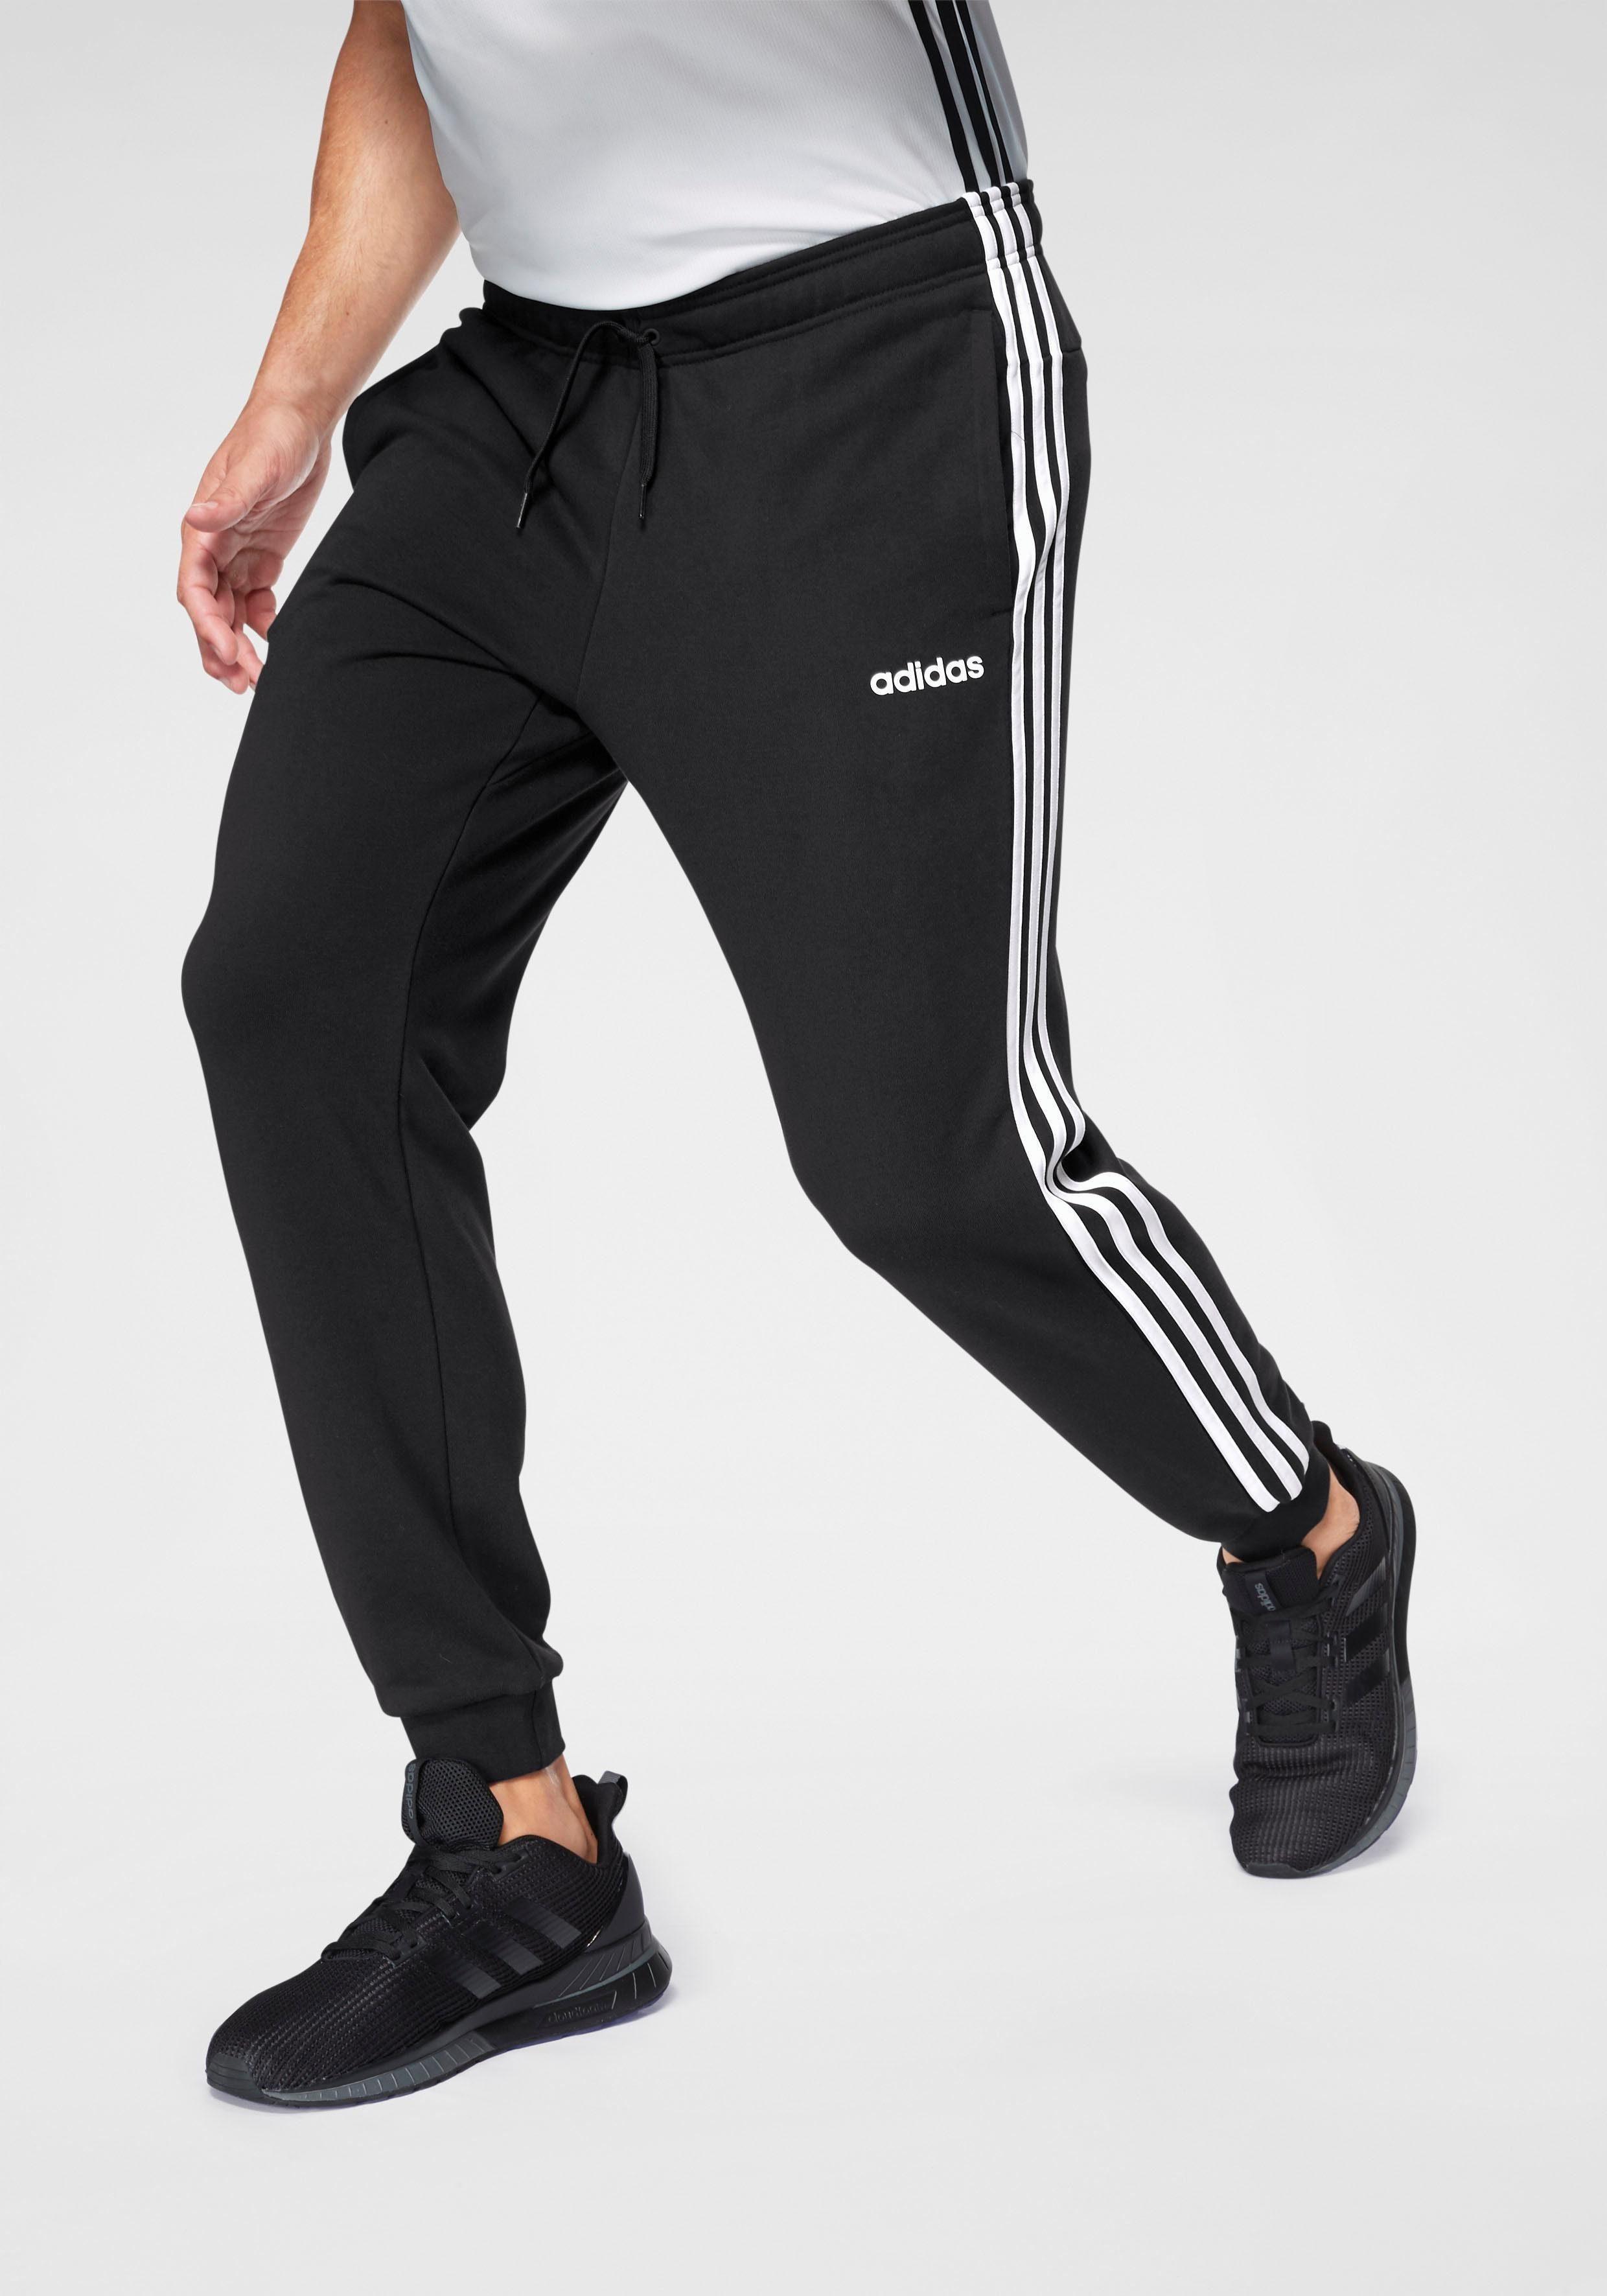 adidas jogginghose 110